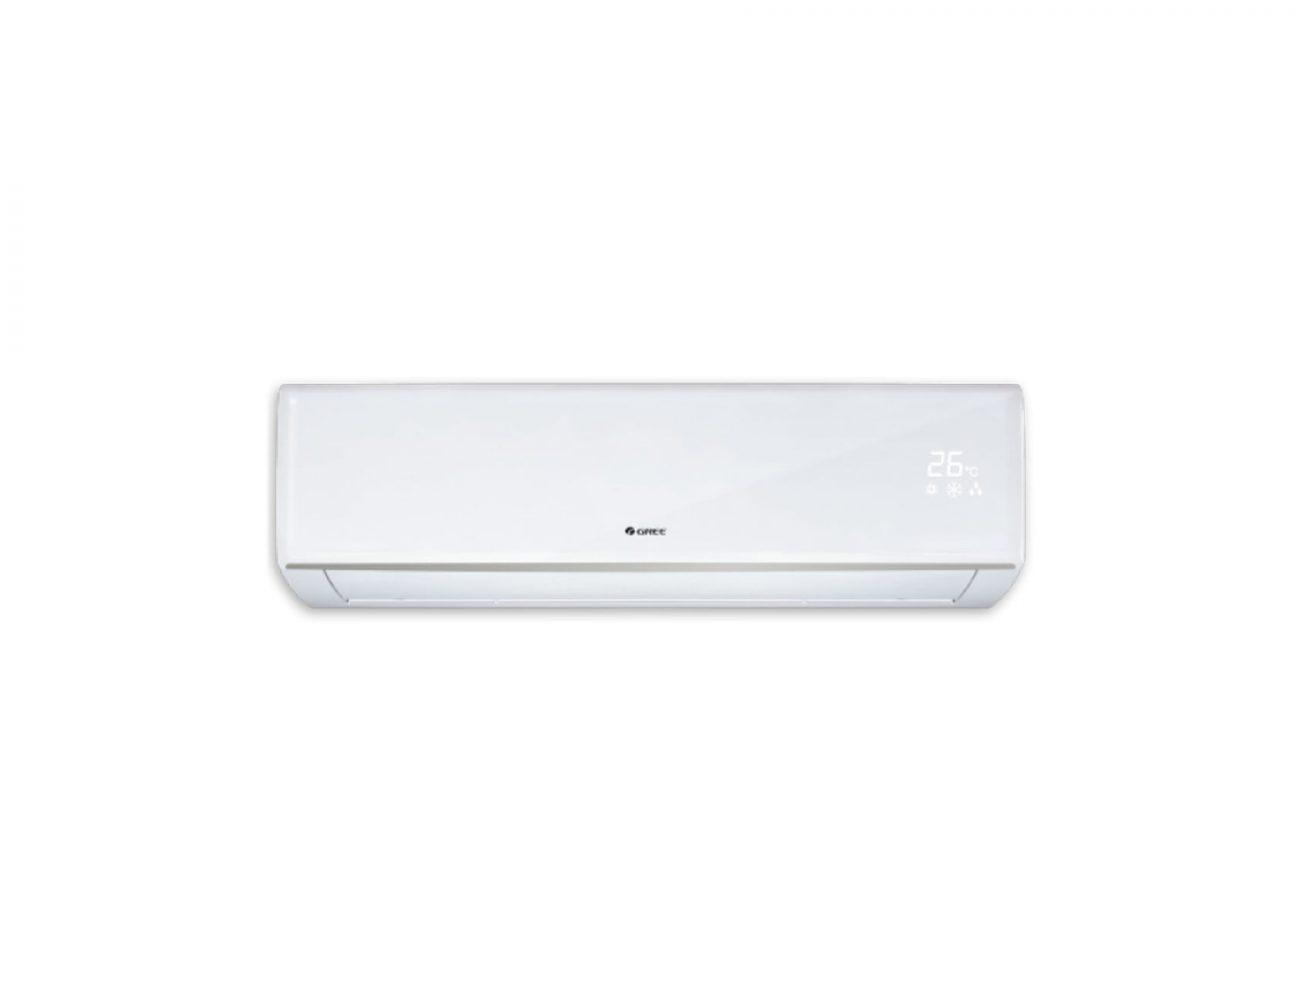 Gree 1.5 Inverter AC Price in Bangladesh | GSH18LMV410